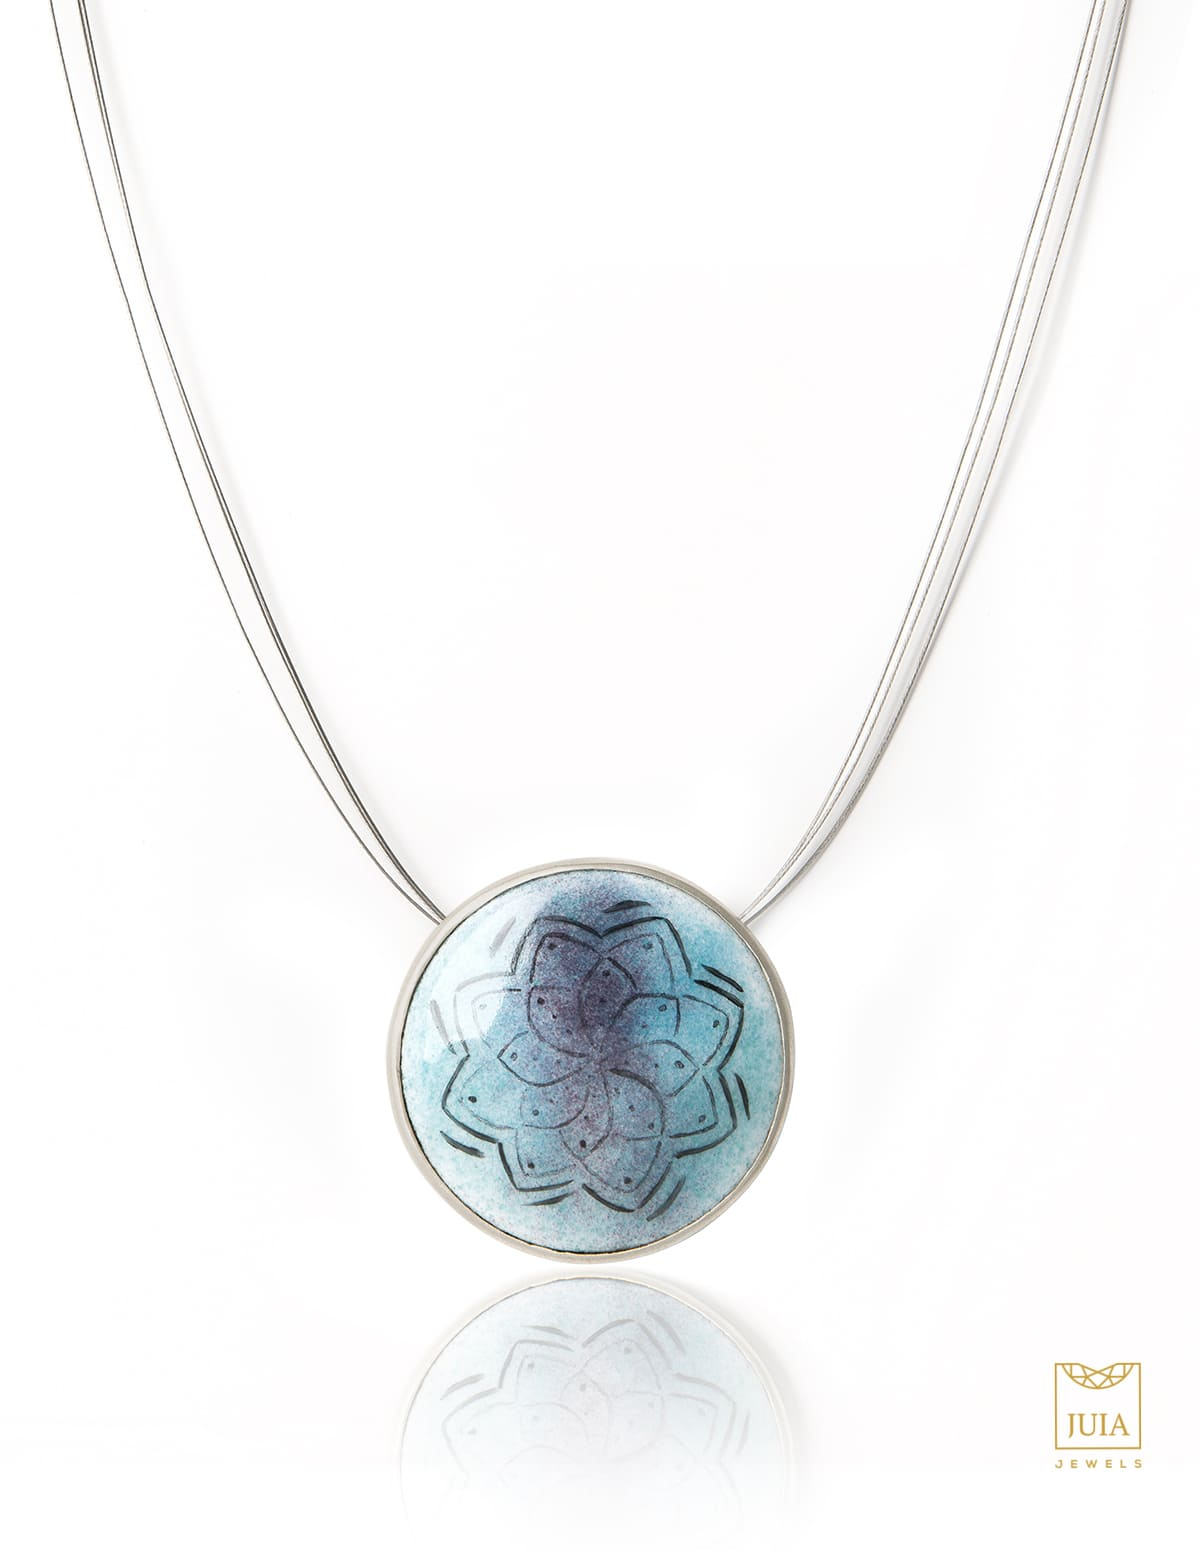 collar de plata para mujer, joyas artesanales, joyas para regalar, juia jewels barcelona, joyasmarket